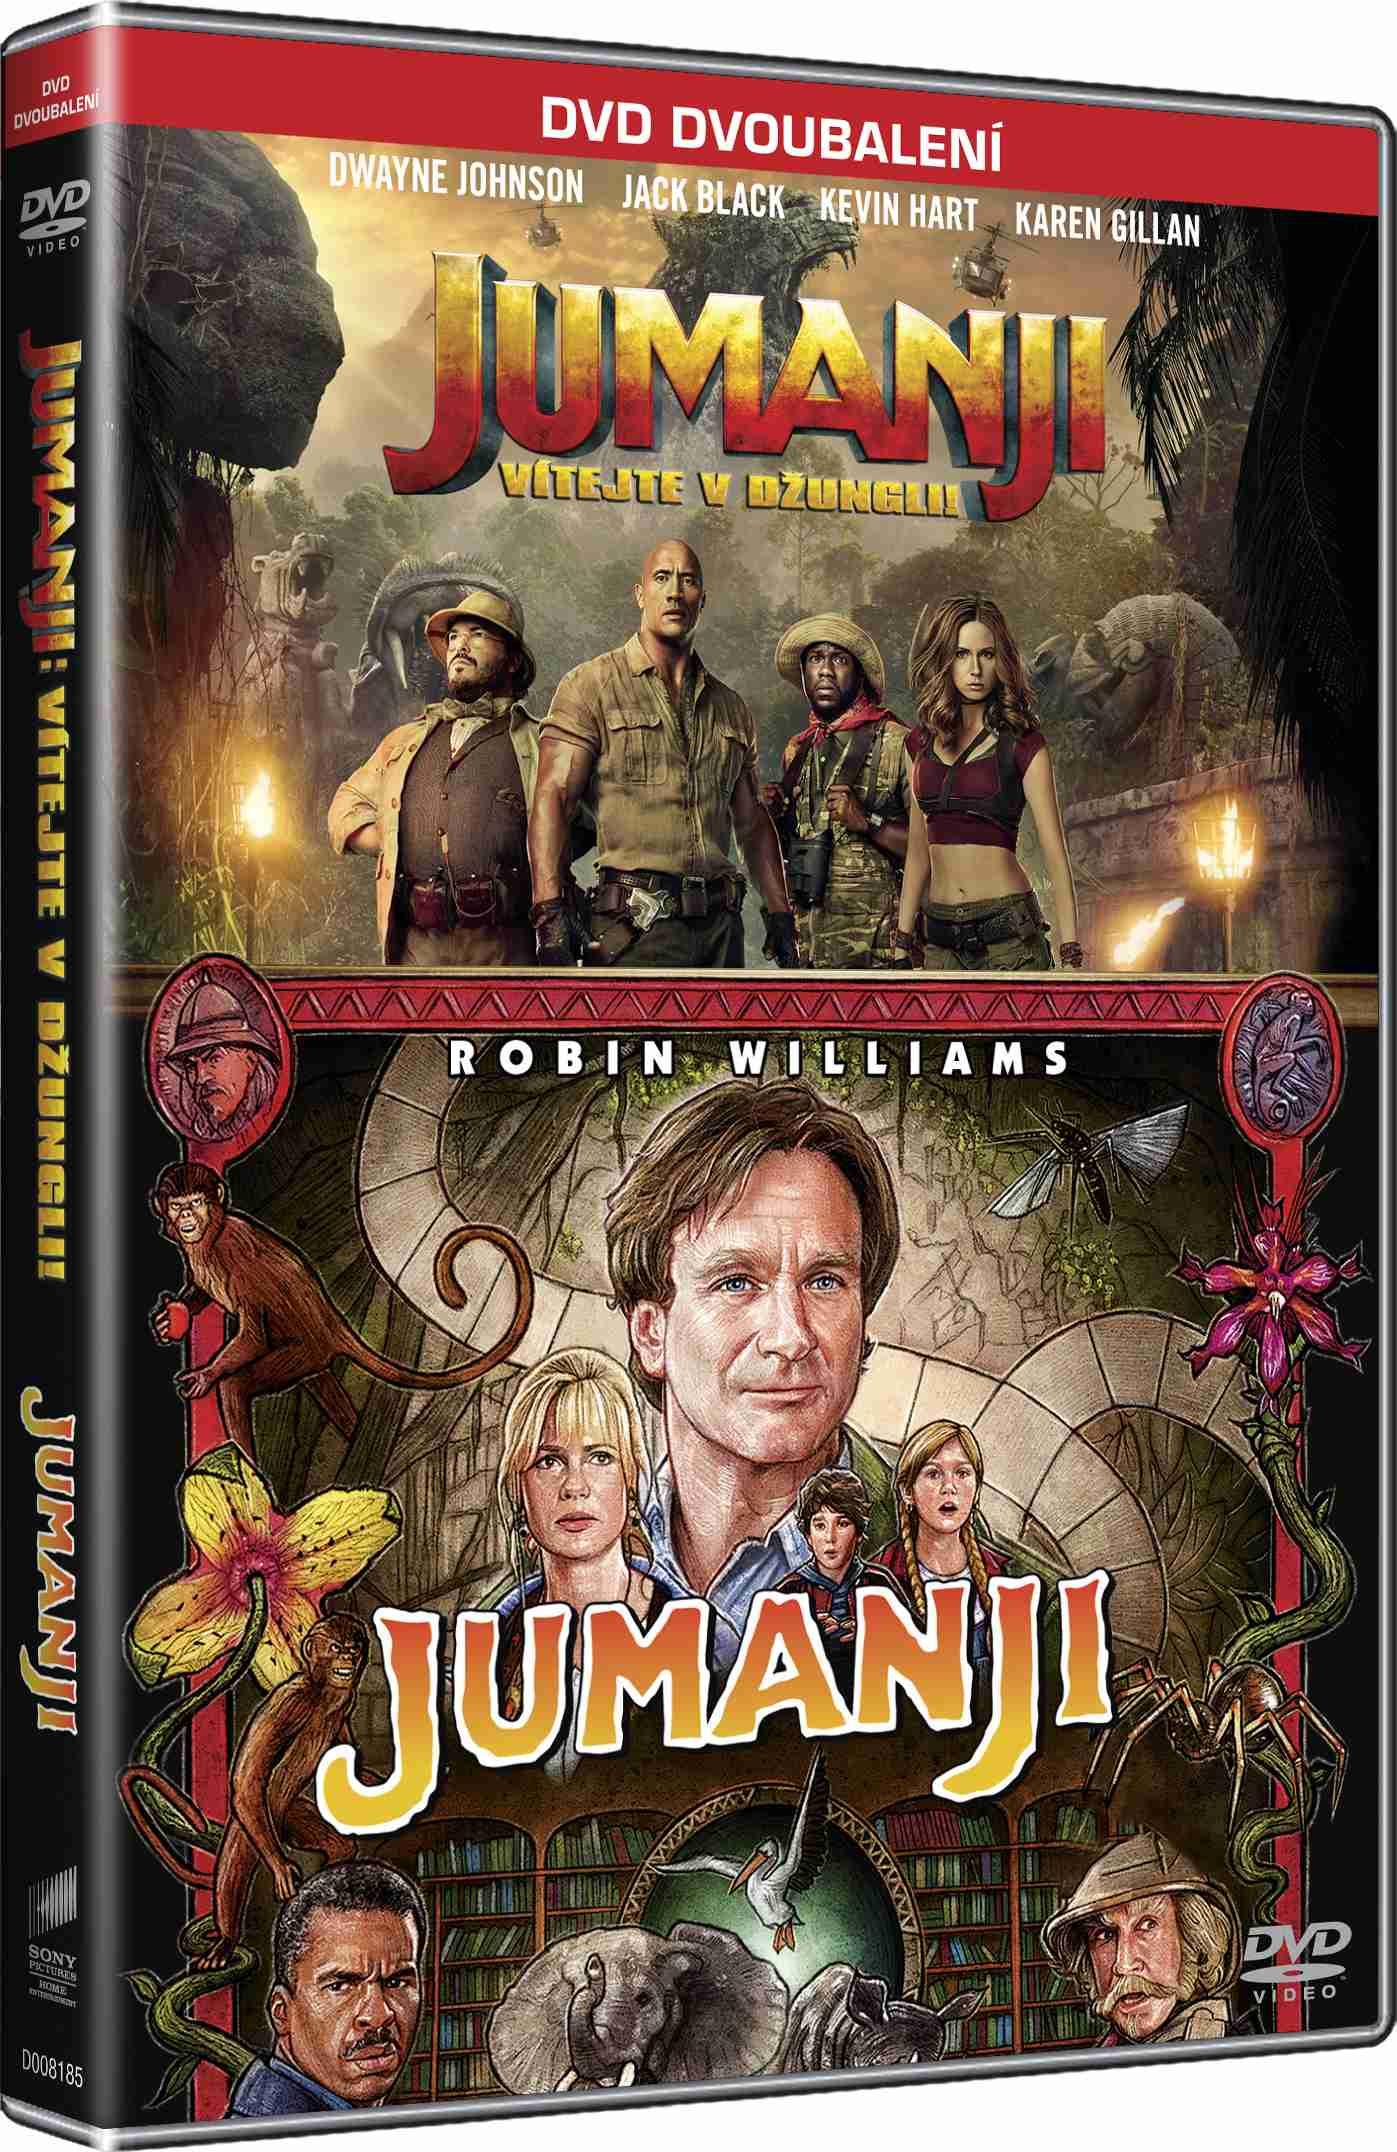 Jumanji 1+2 kolekce - 2 DVD (SK obal)